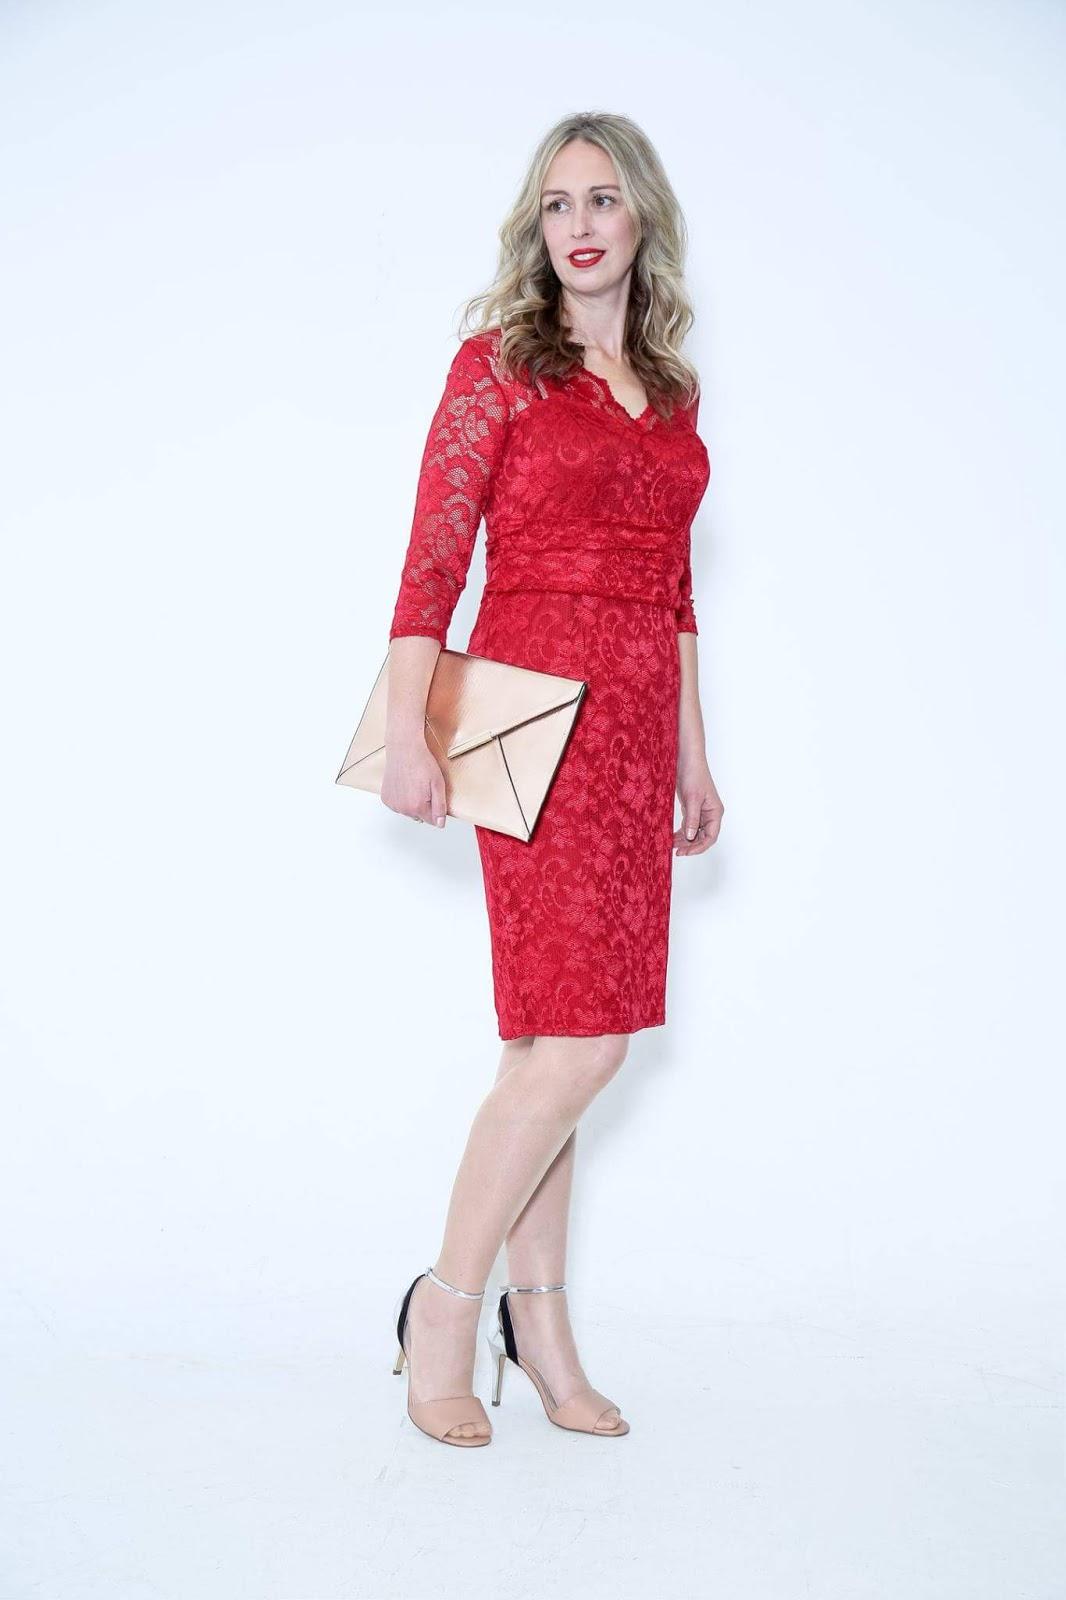 Red Lace Dress: Motivational Monday